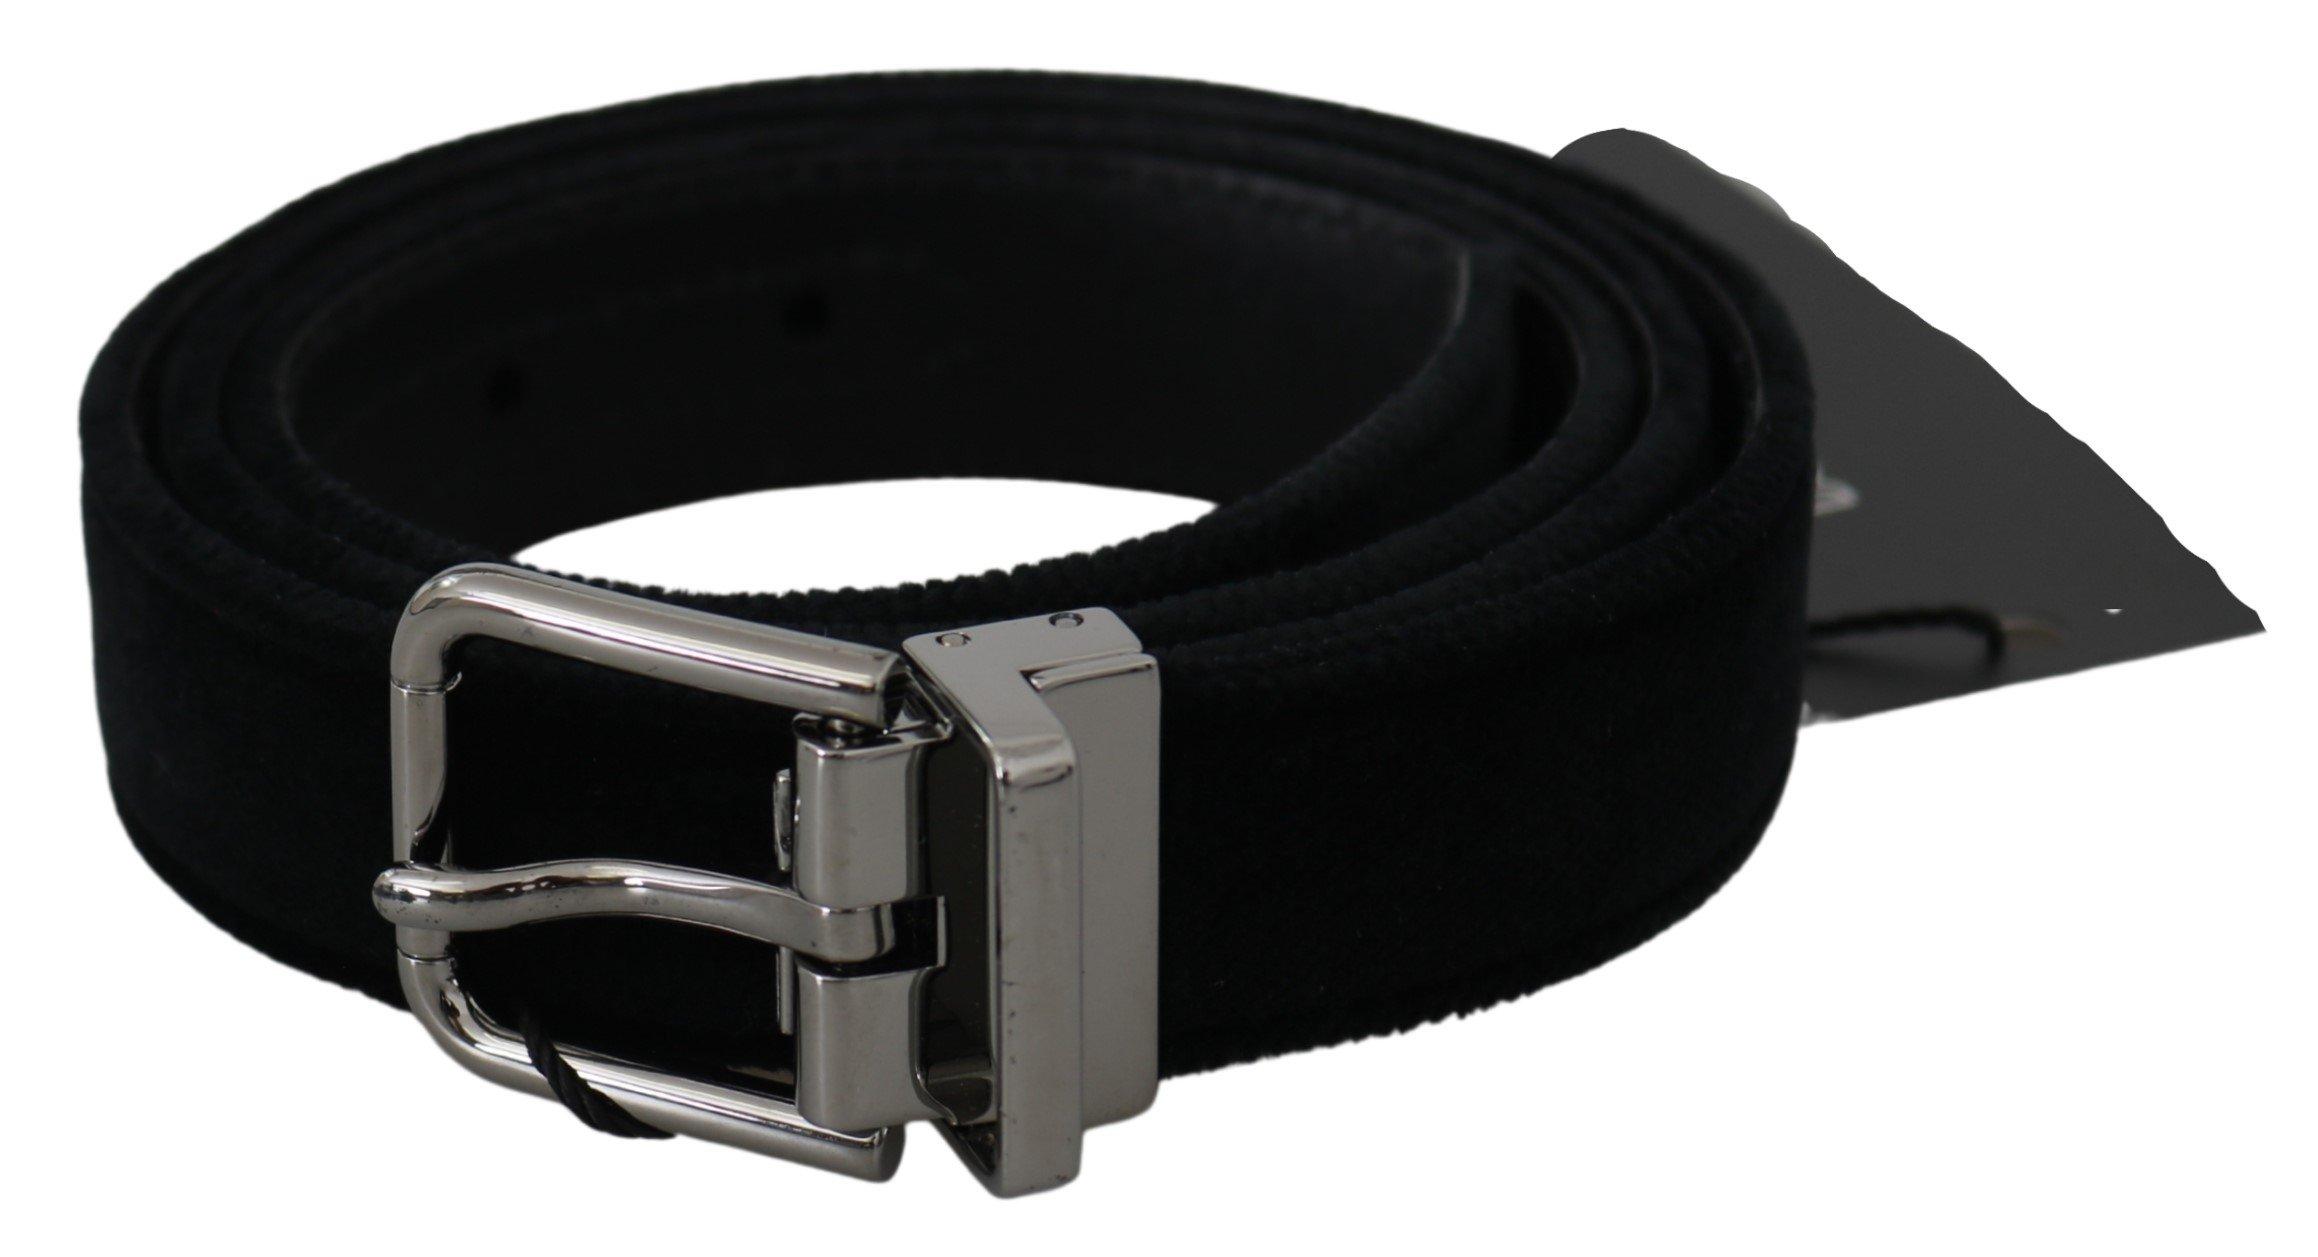 Black Velvet Leather Silver Buckle Belt - 115 cm / 46 Inches